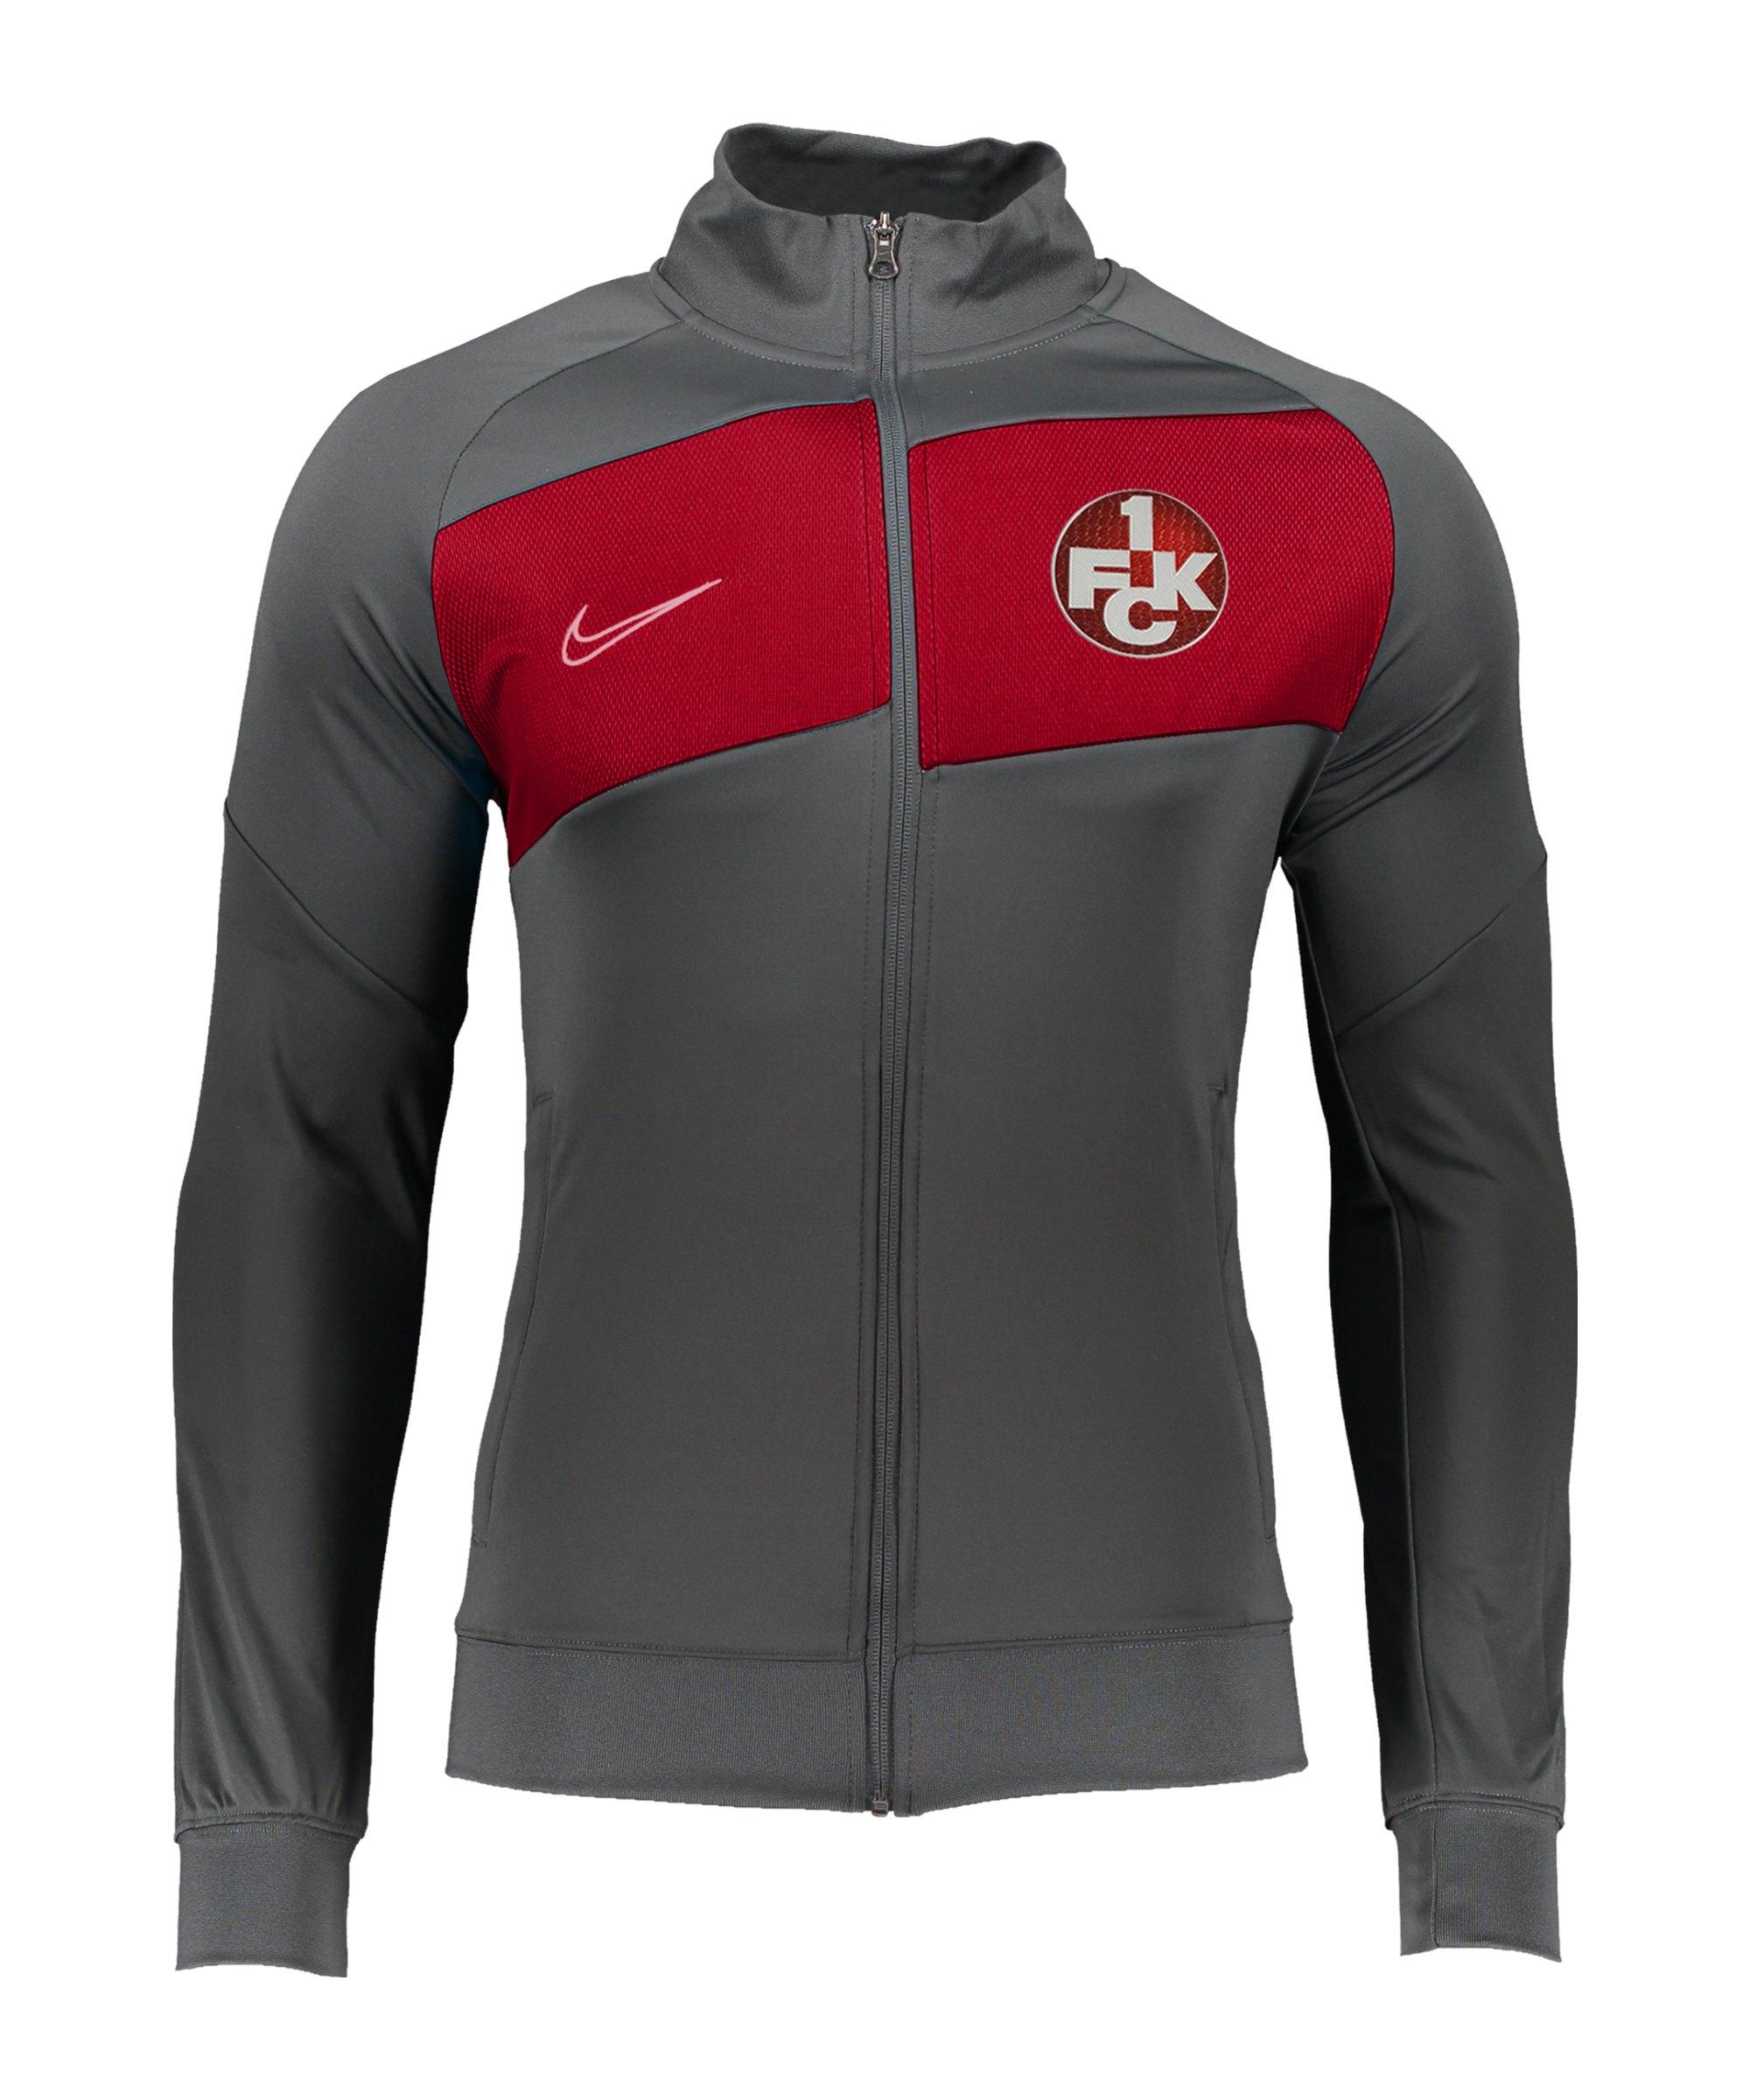 Nike 1. FC Kaiserslautern Jacke Kids F062 - grau